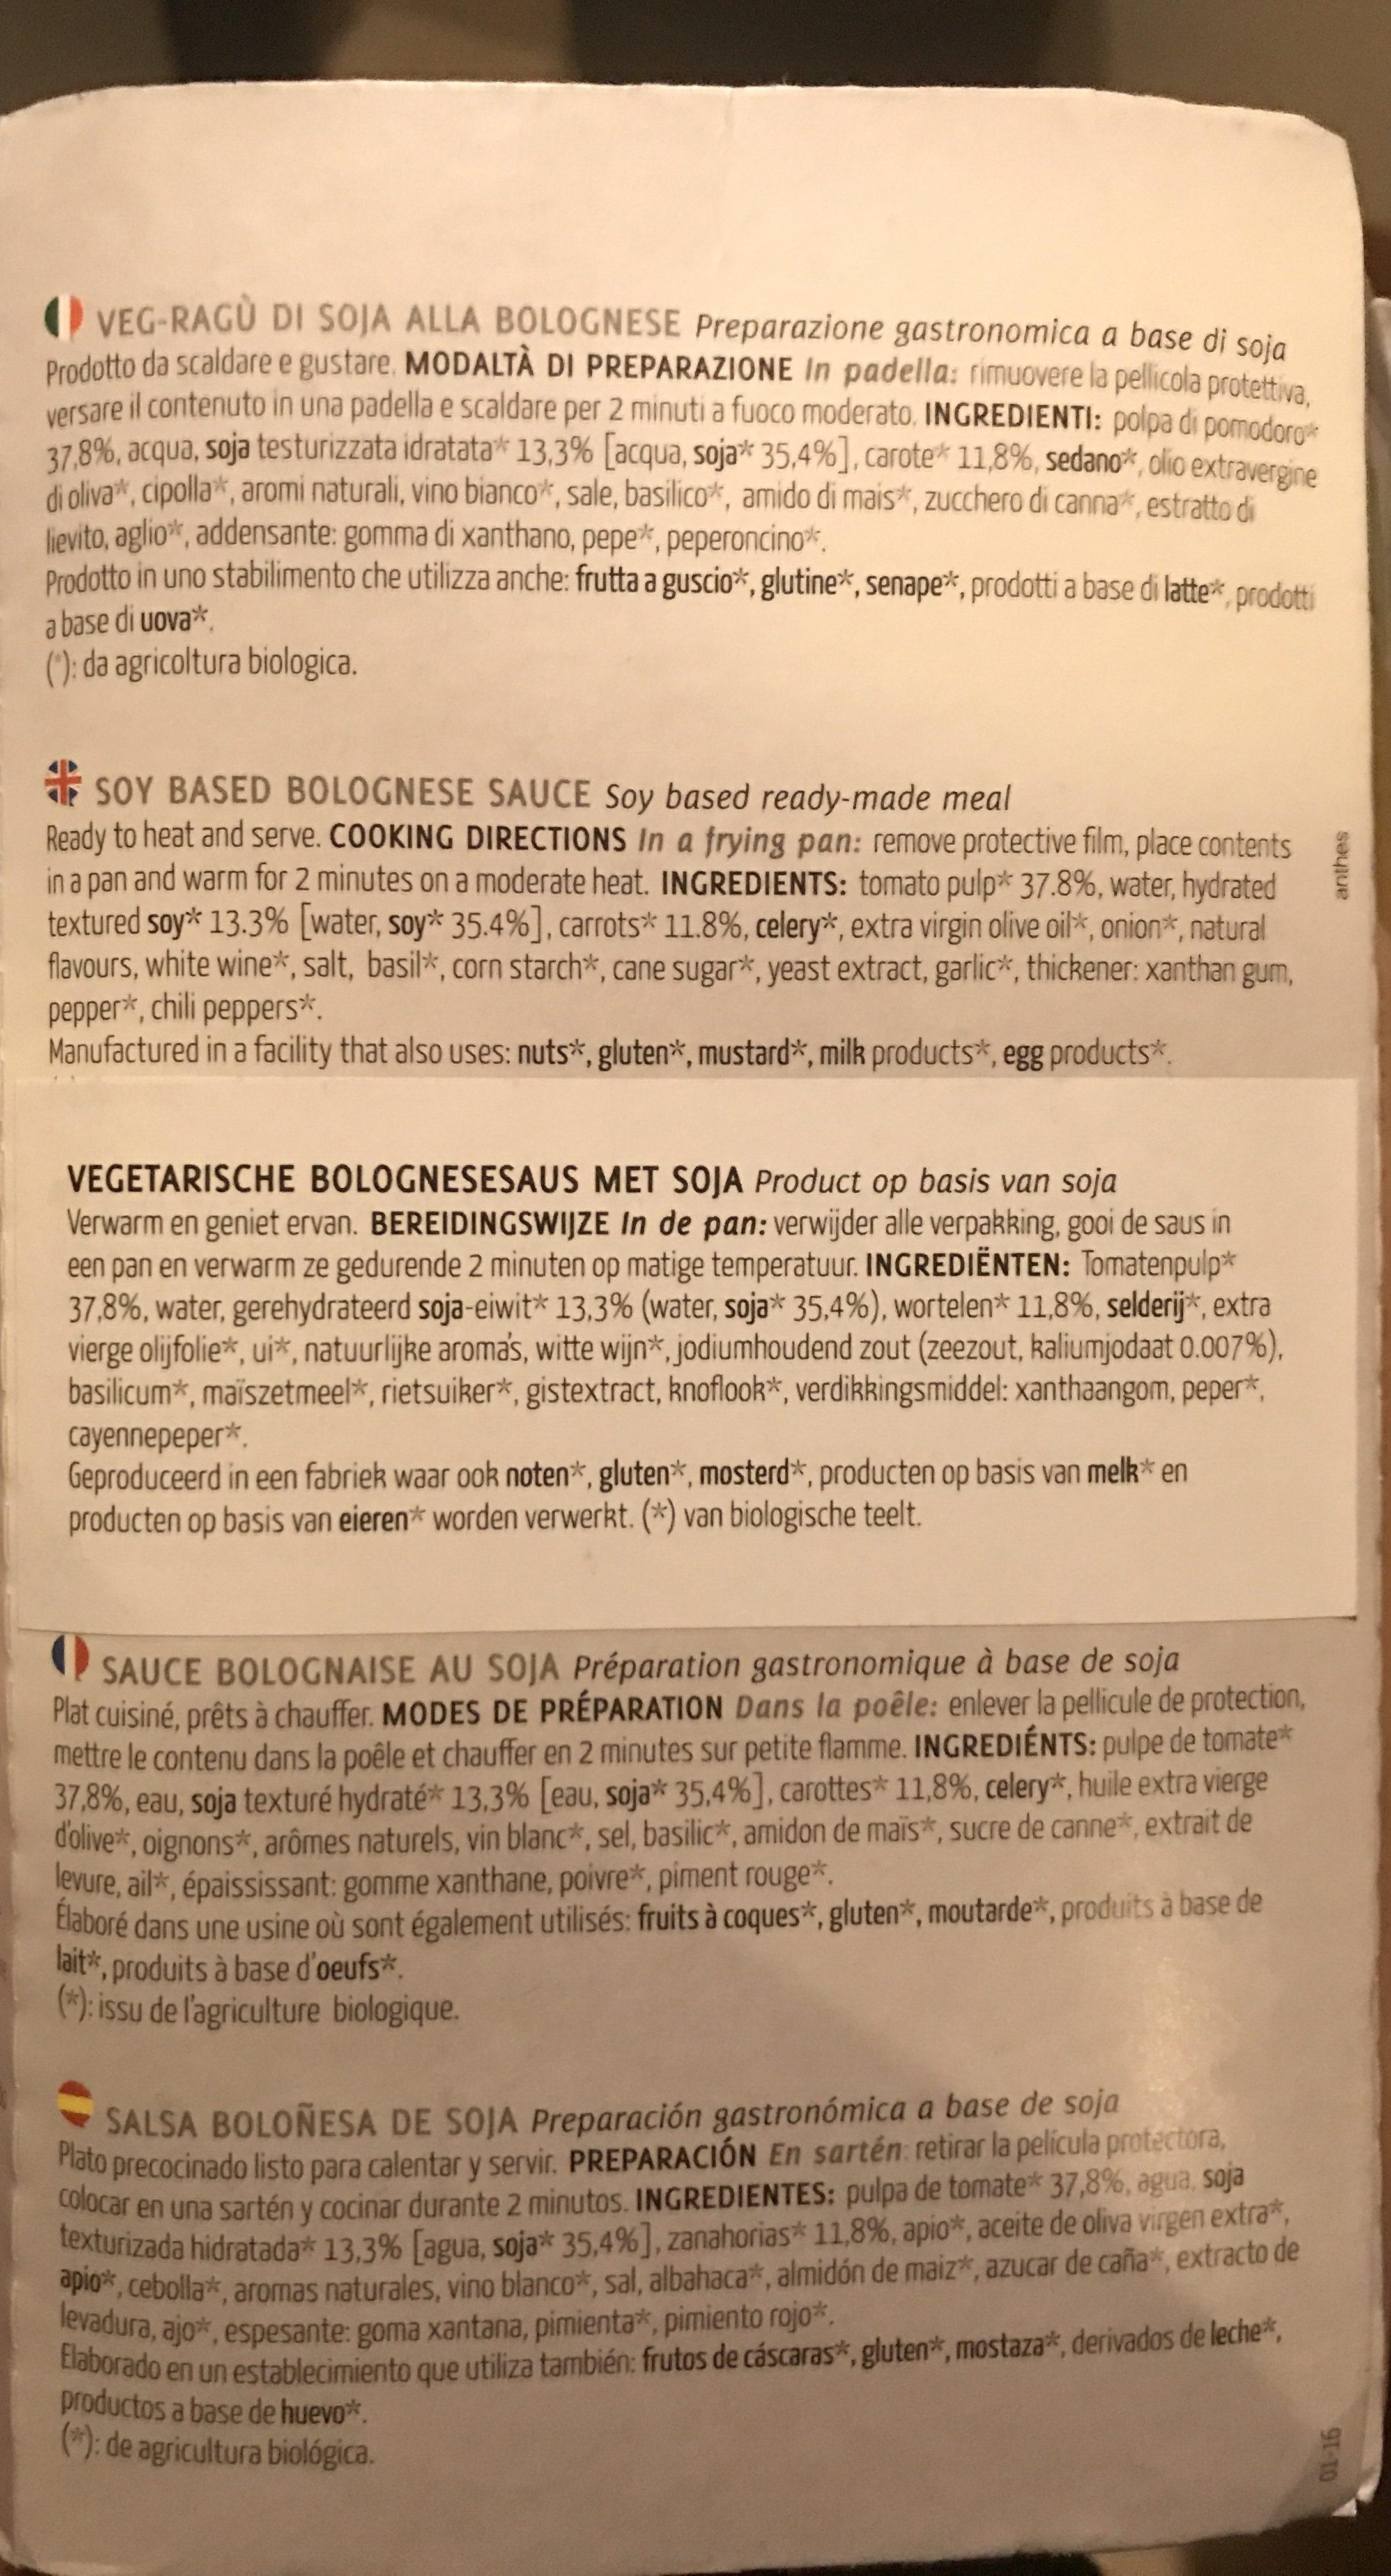 Veg-ragu Di Soja Alla Bolognese - Ingredients